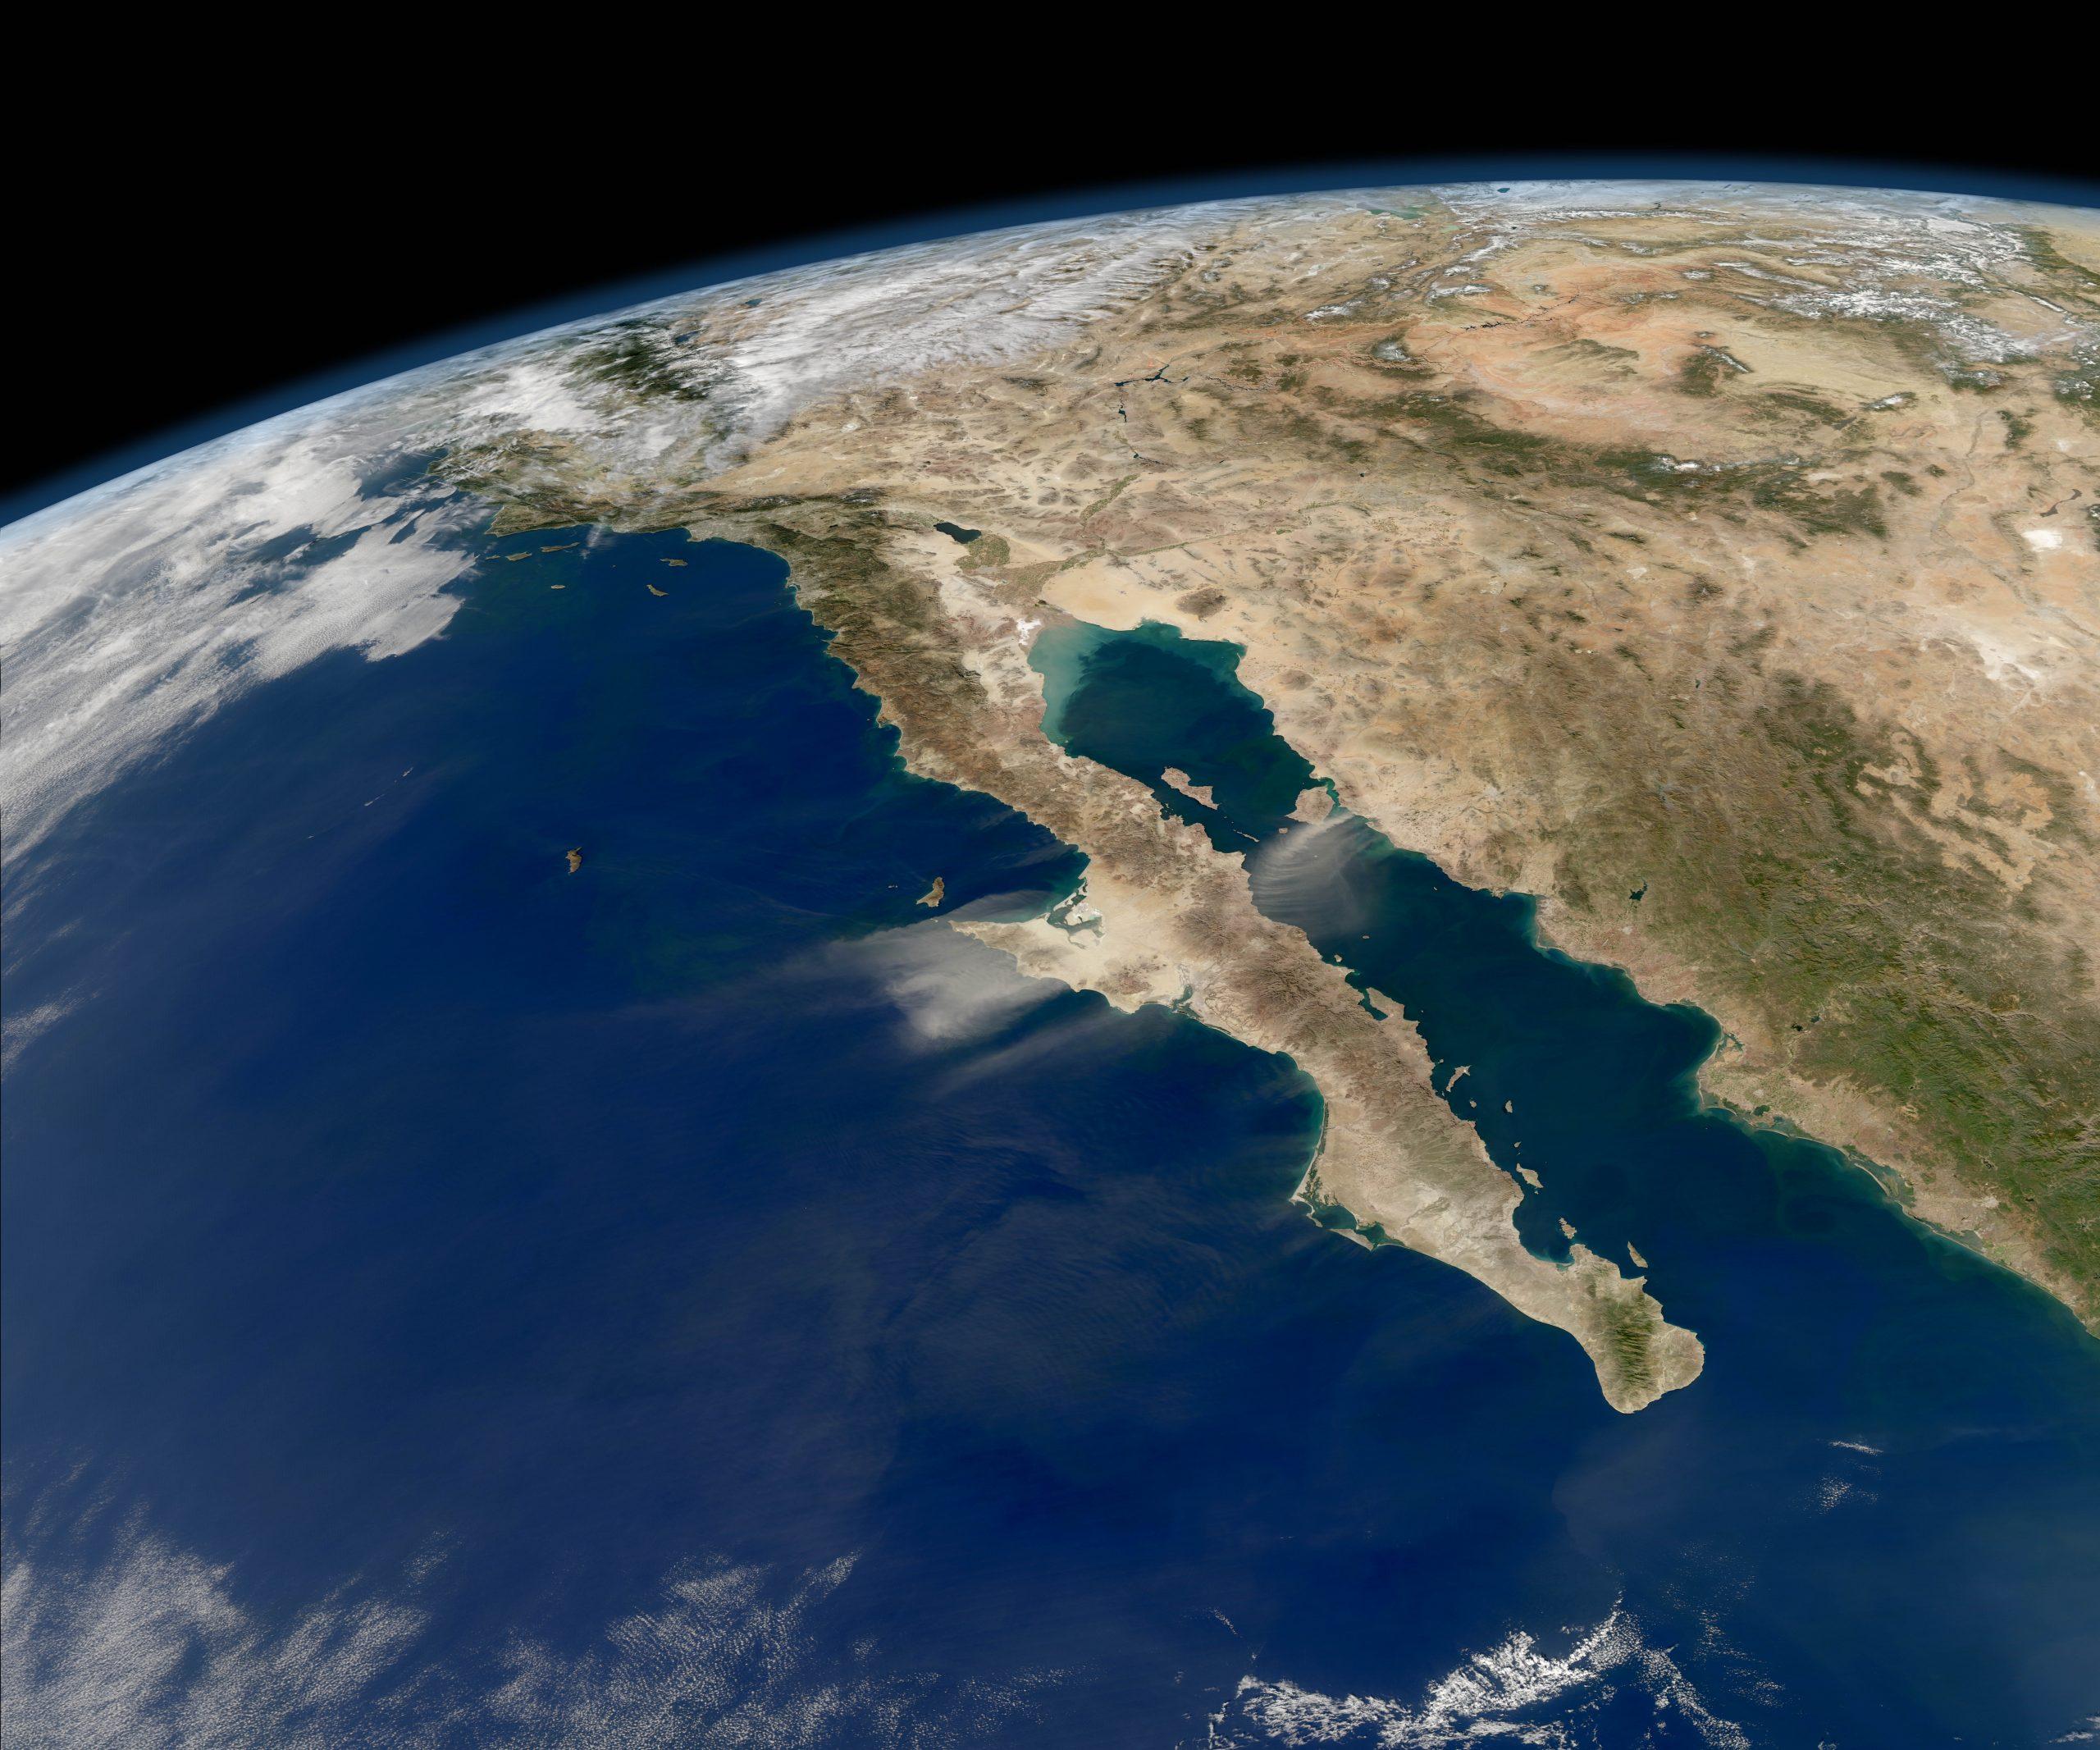 Península de Baja California desde el satélite Aqua